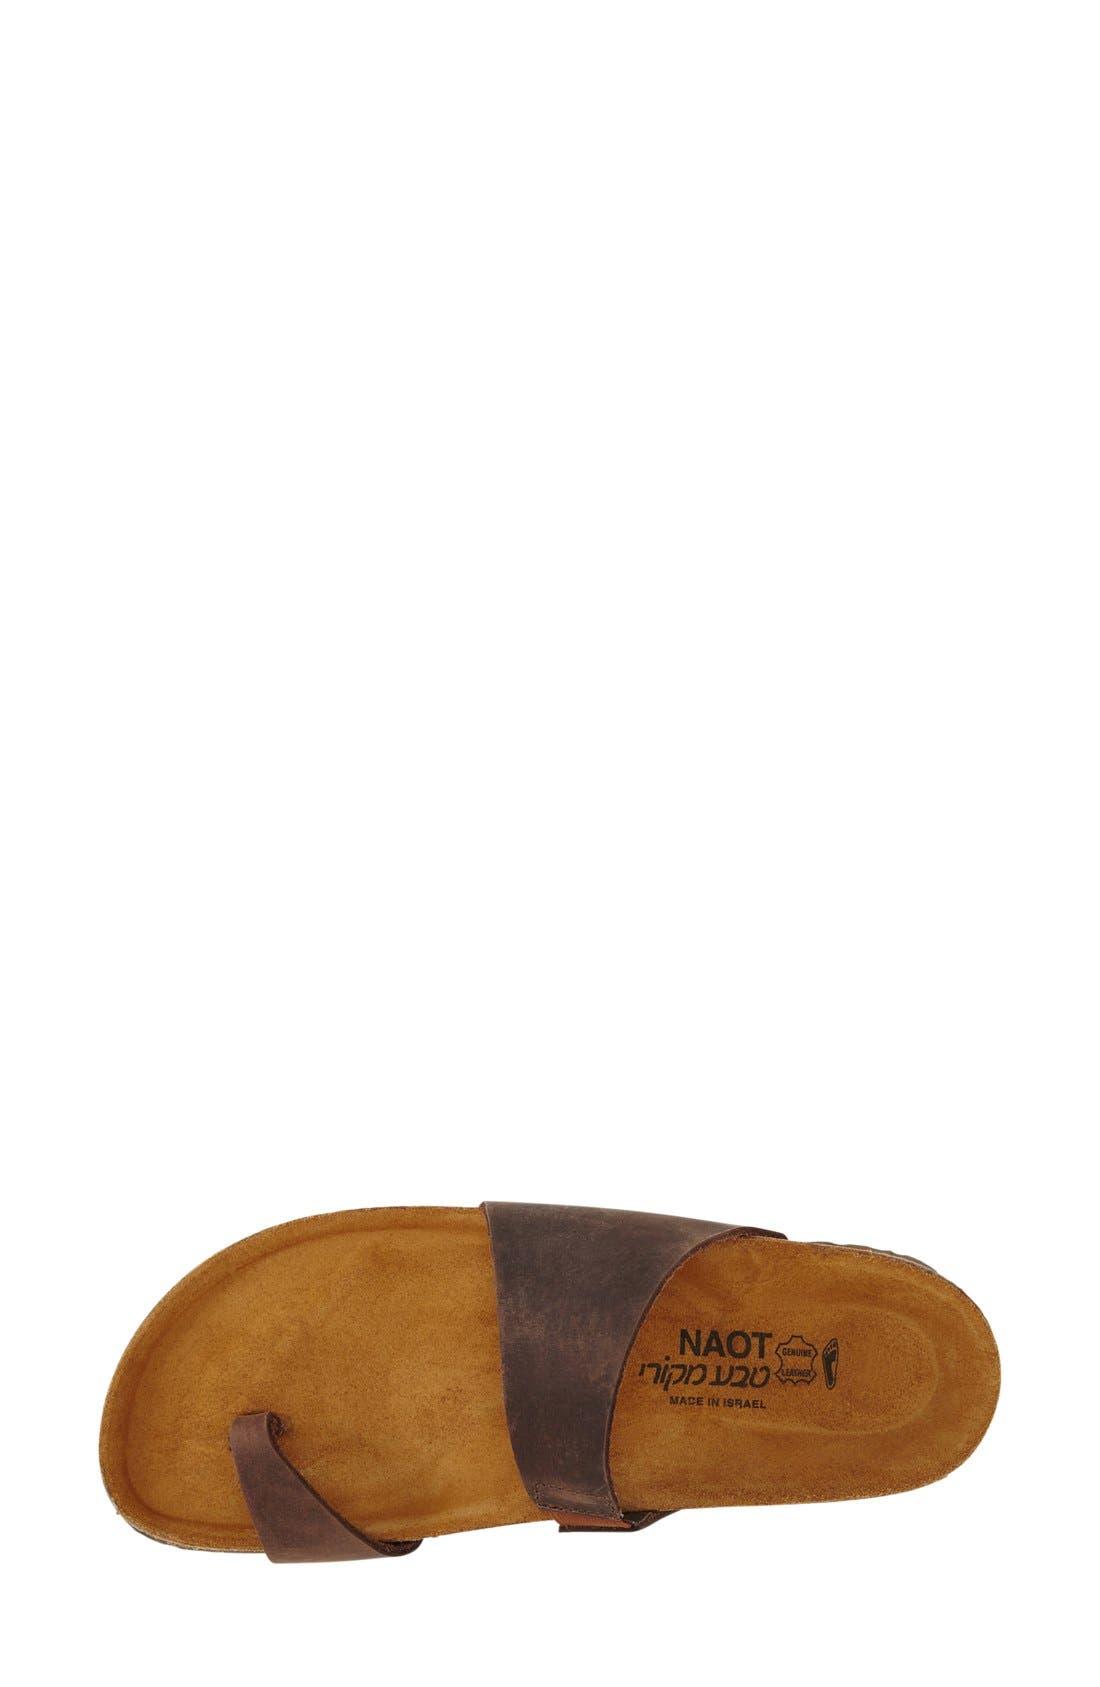 'Santa Fe' Sandal,                             Alternate thumbnail 3, color,                             200